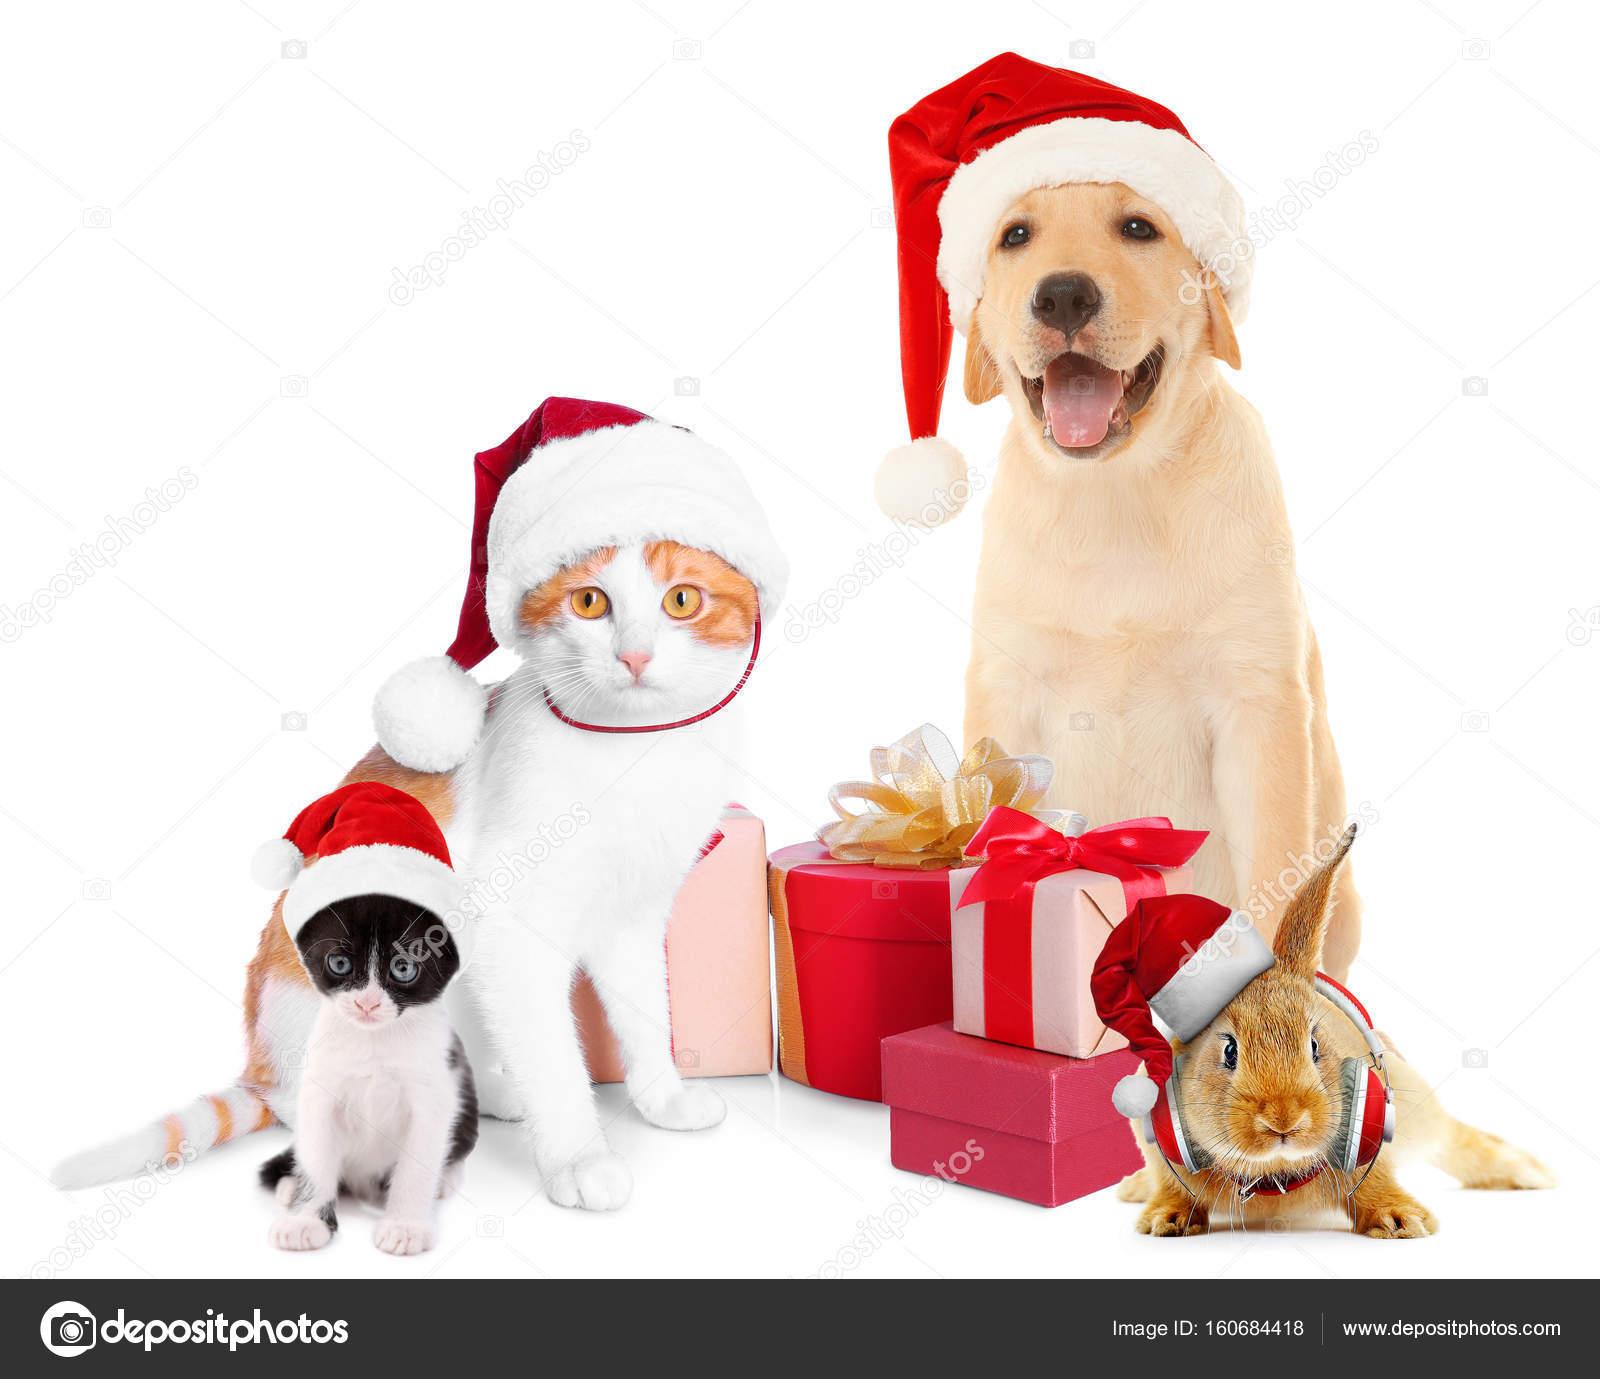 6ae9d7ba5b9dc Funny pets in Santa hats — Stock Photo © belchonock  160684418